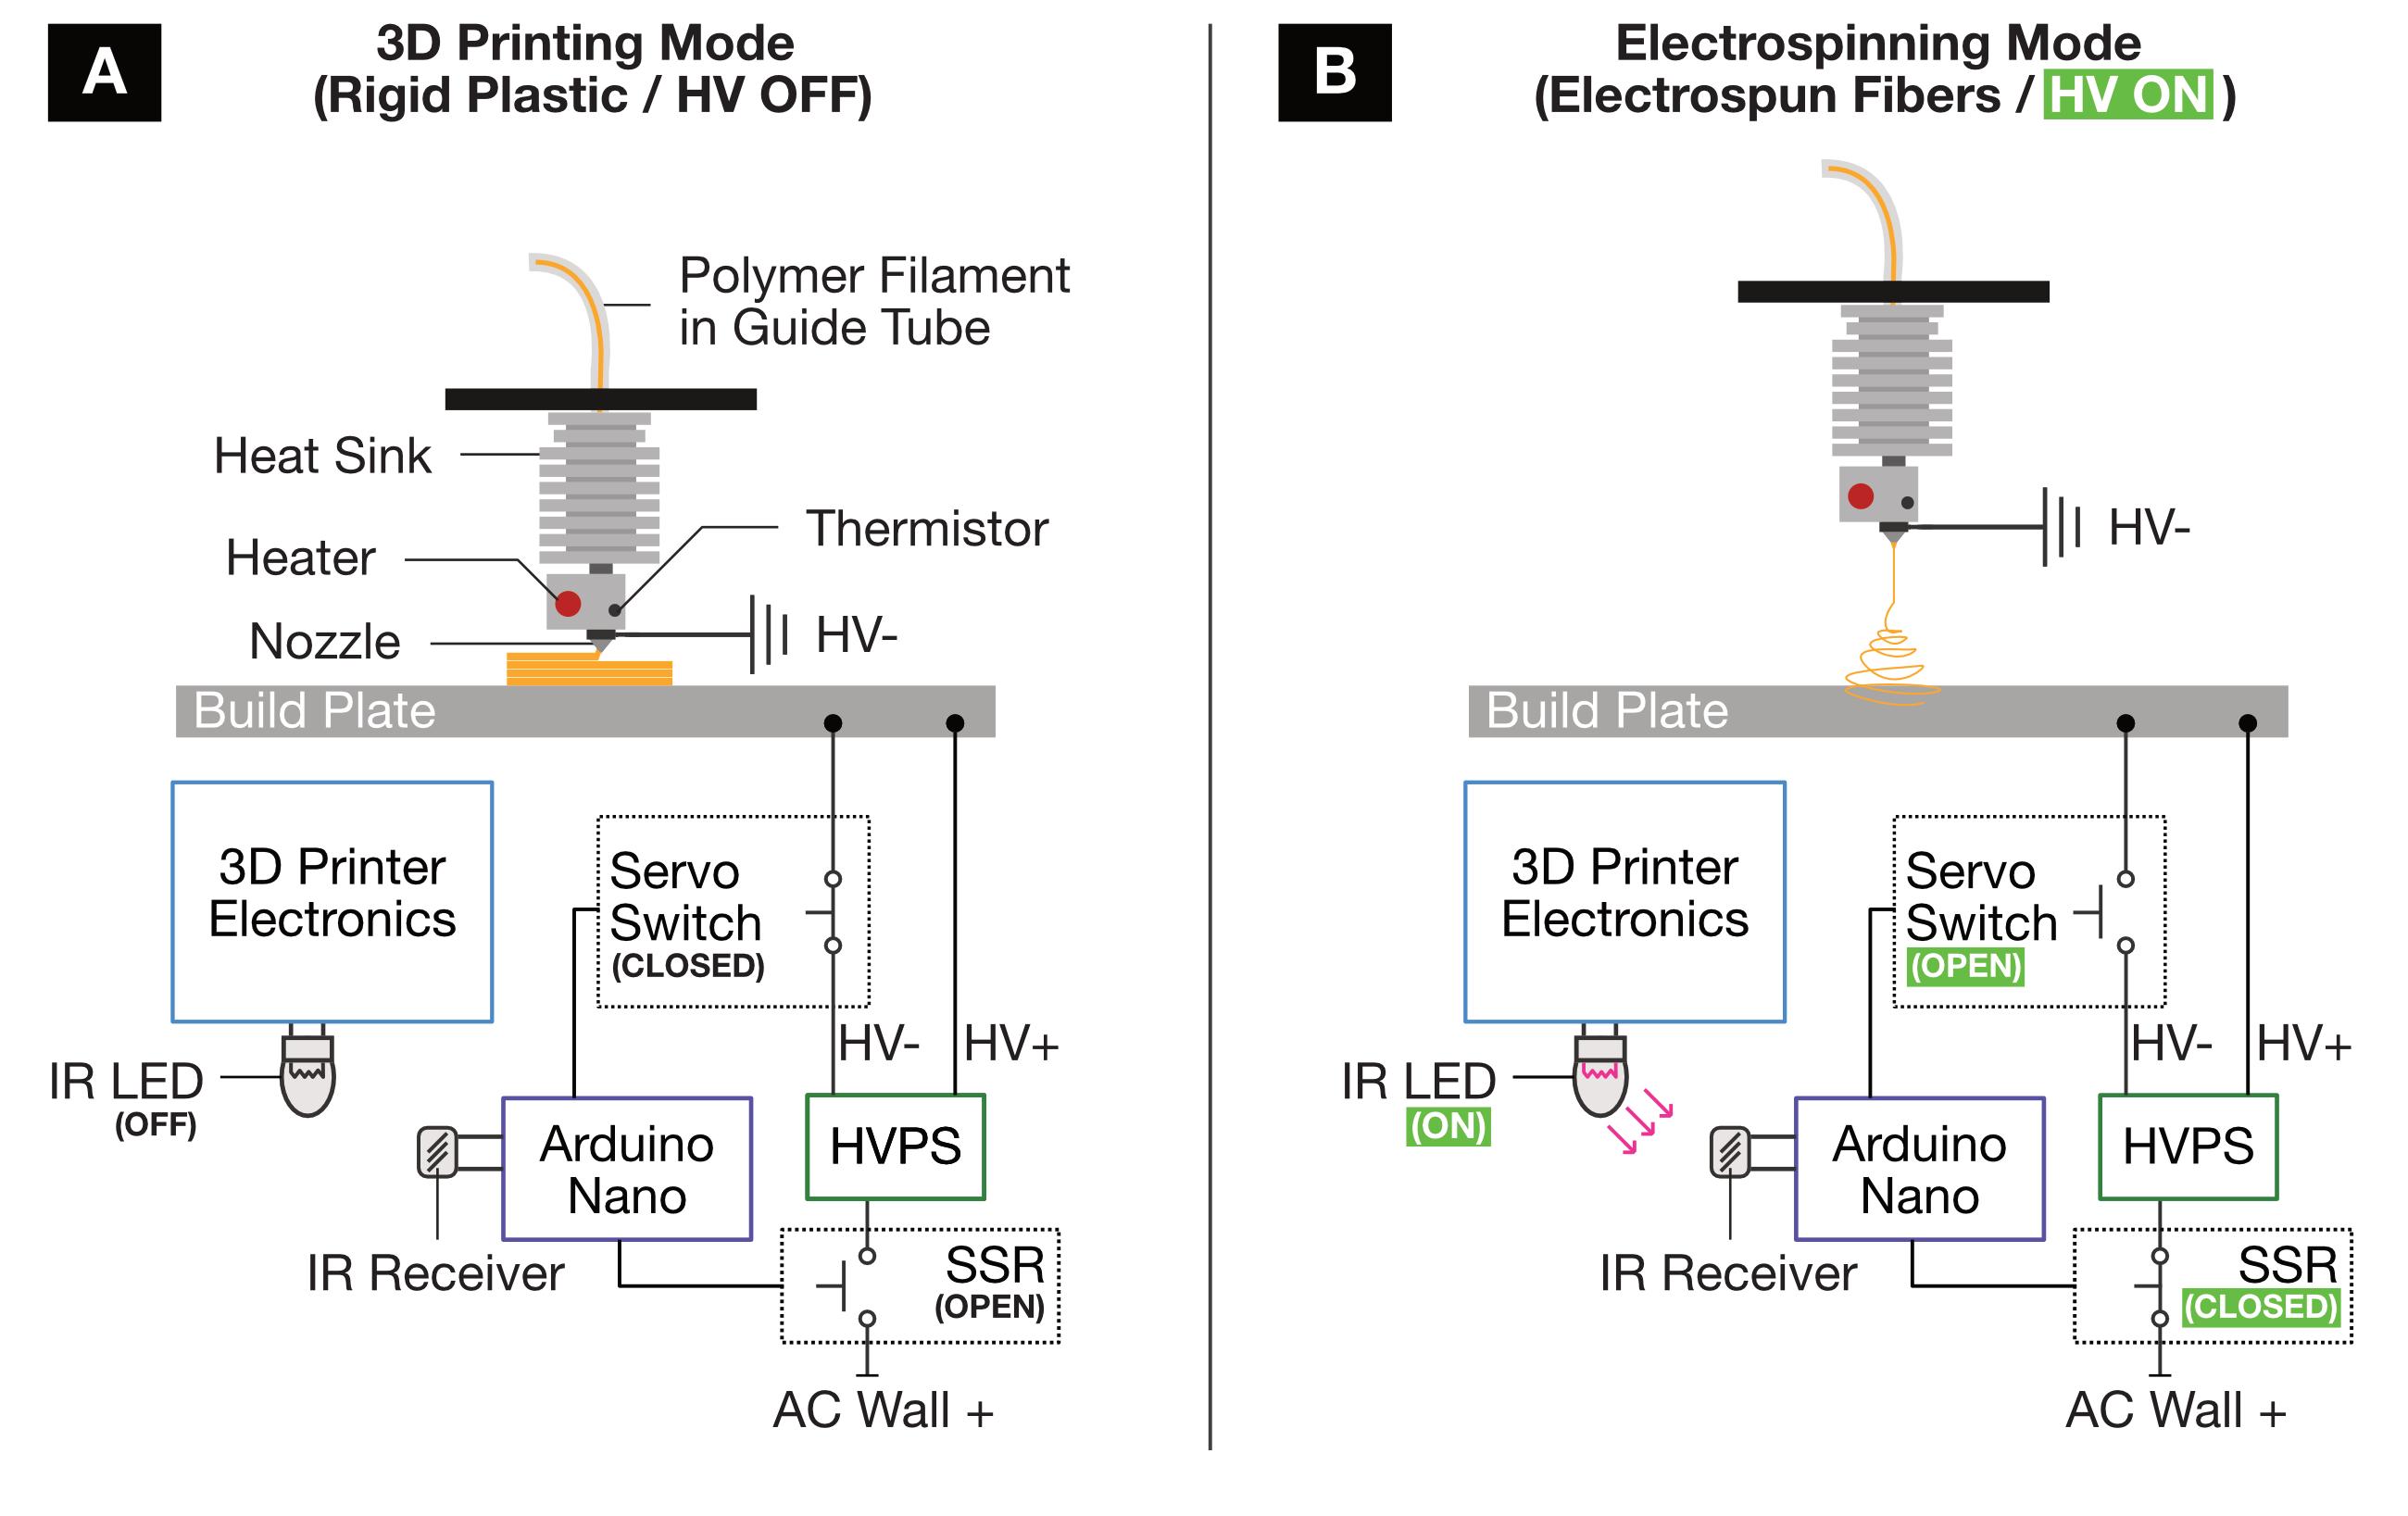 3D printer and melt electrospinning setup